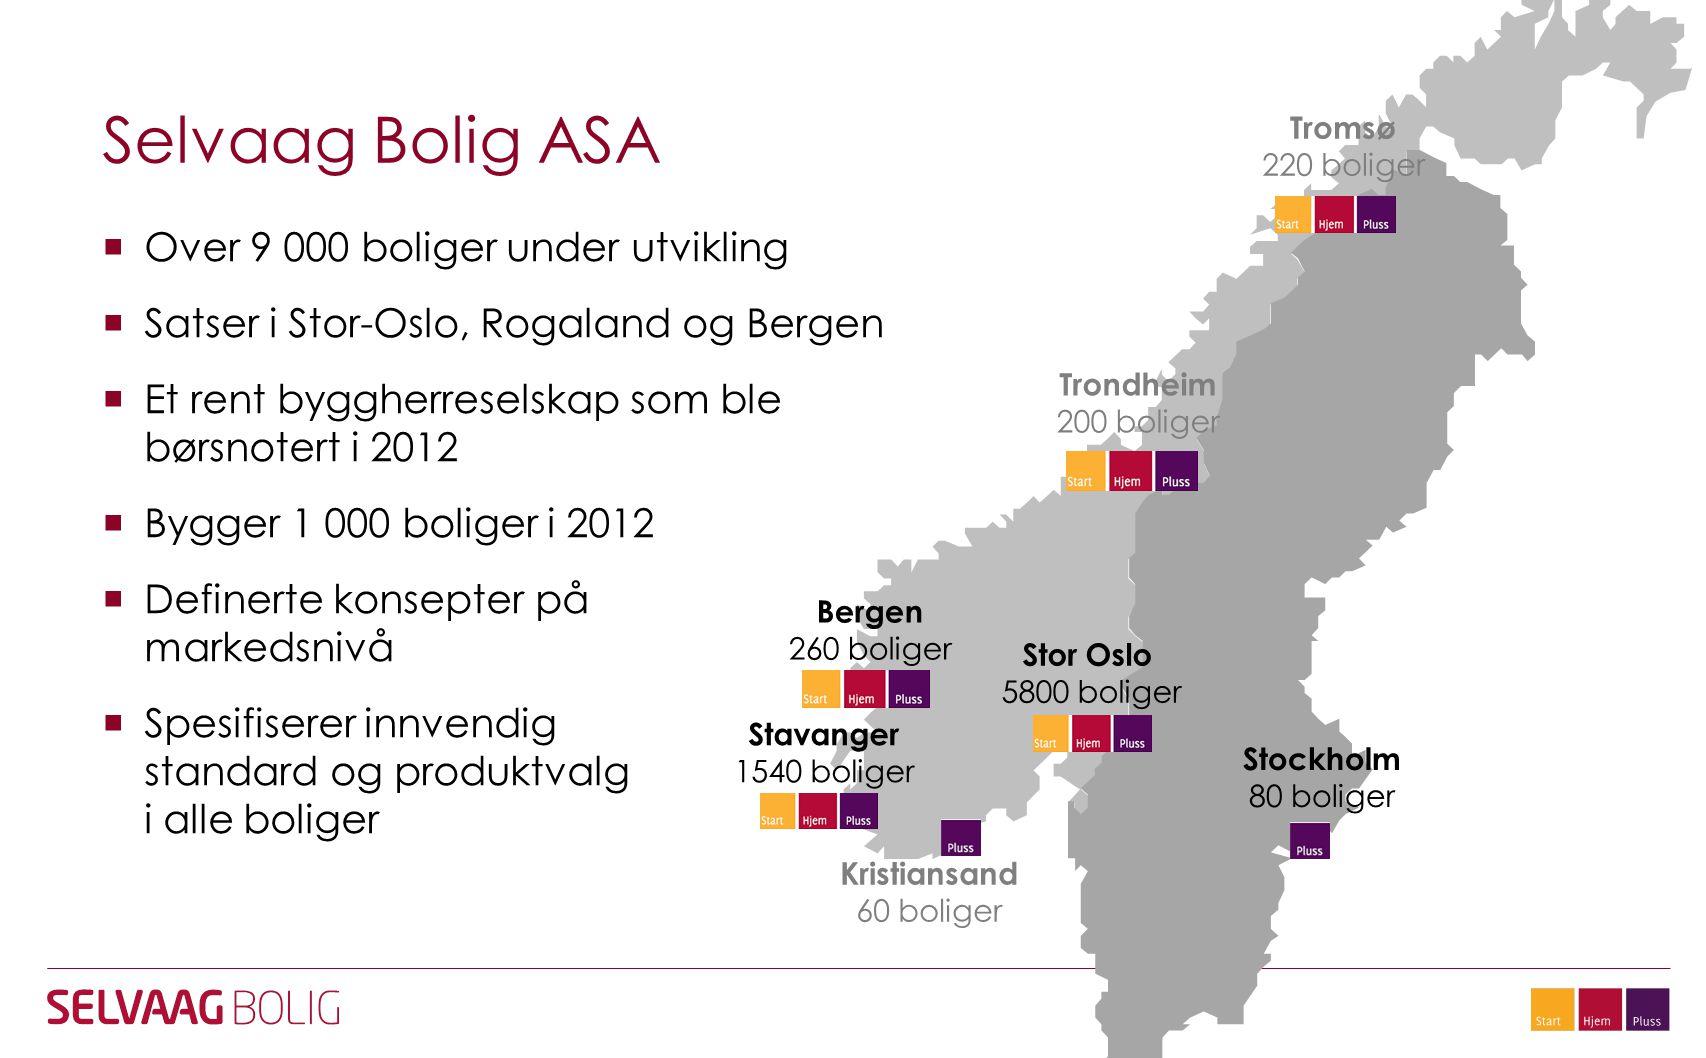 Tromsø 220 boliger Trondheim 200 boliger Stockholm 80 boliger Stor Oslo 5800 boliger Bergen 260 boliger Stavanger 1540 boliger Kristiansand 60 boliger Selvaag Bolig ASA  Over 9 000 boliger under utvikling  Satser i Stor-Oslo, Rogaland og Bergen  Et rent byggherreselskap som ble børsnotert i 2012  Bygger 1 000 boliger i 2012  Definerte konsepter på markedsnivå  Spesifiserer innvendig standard og produktvalg i alle boliger